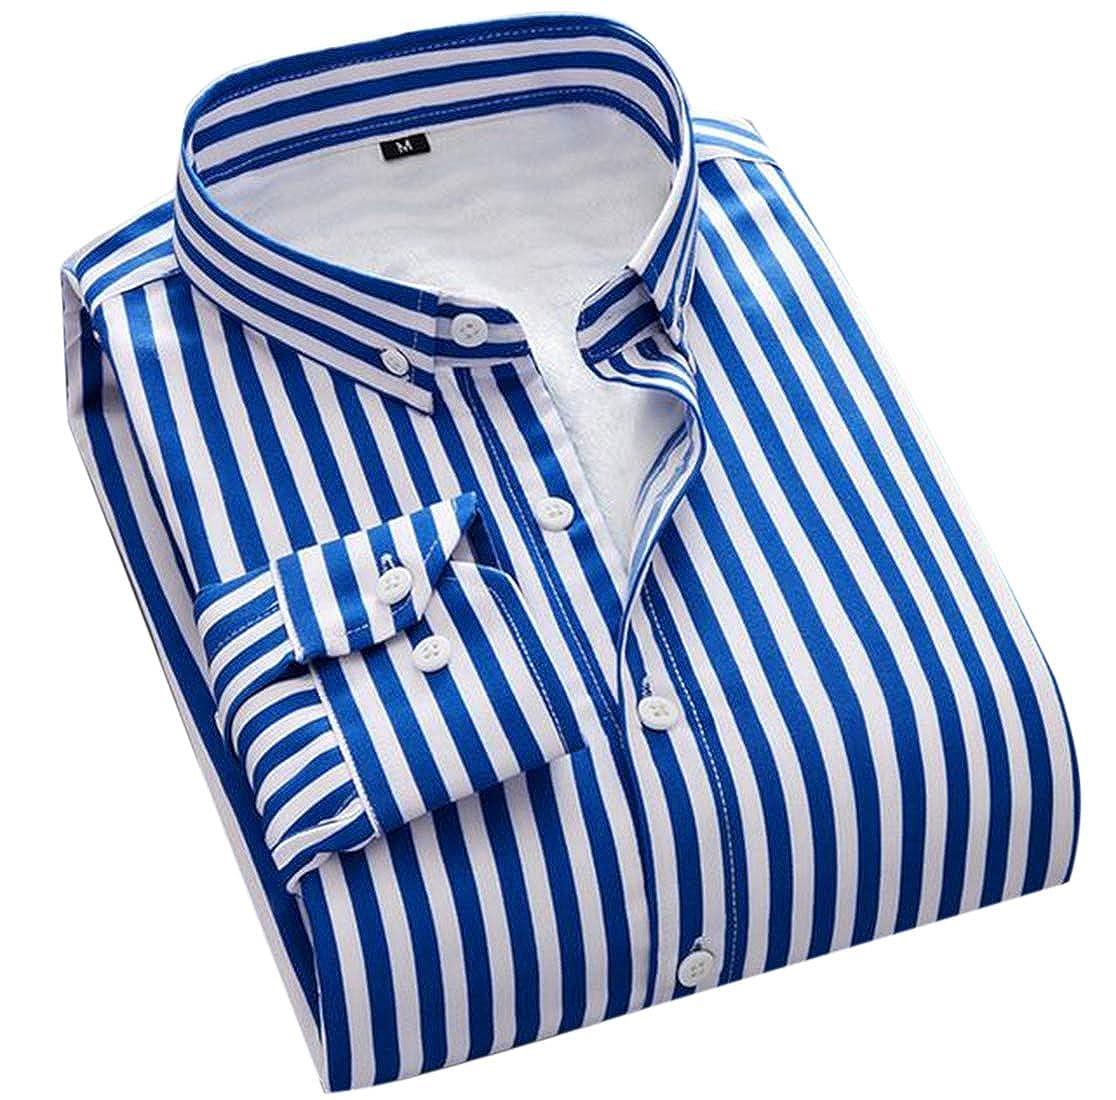 SELX Men Striped Long Sleeve Office Fleece Thermal Boyfriend Button up Shirts